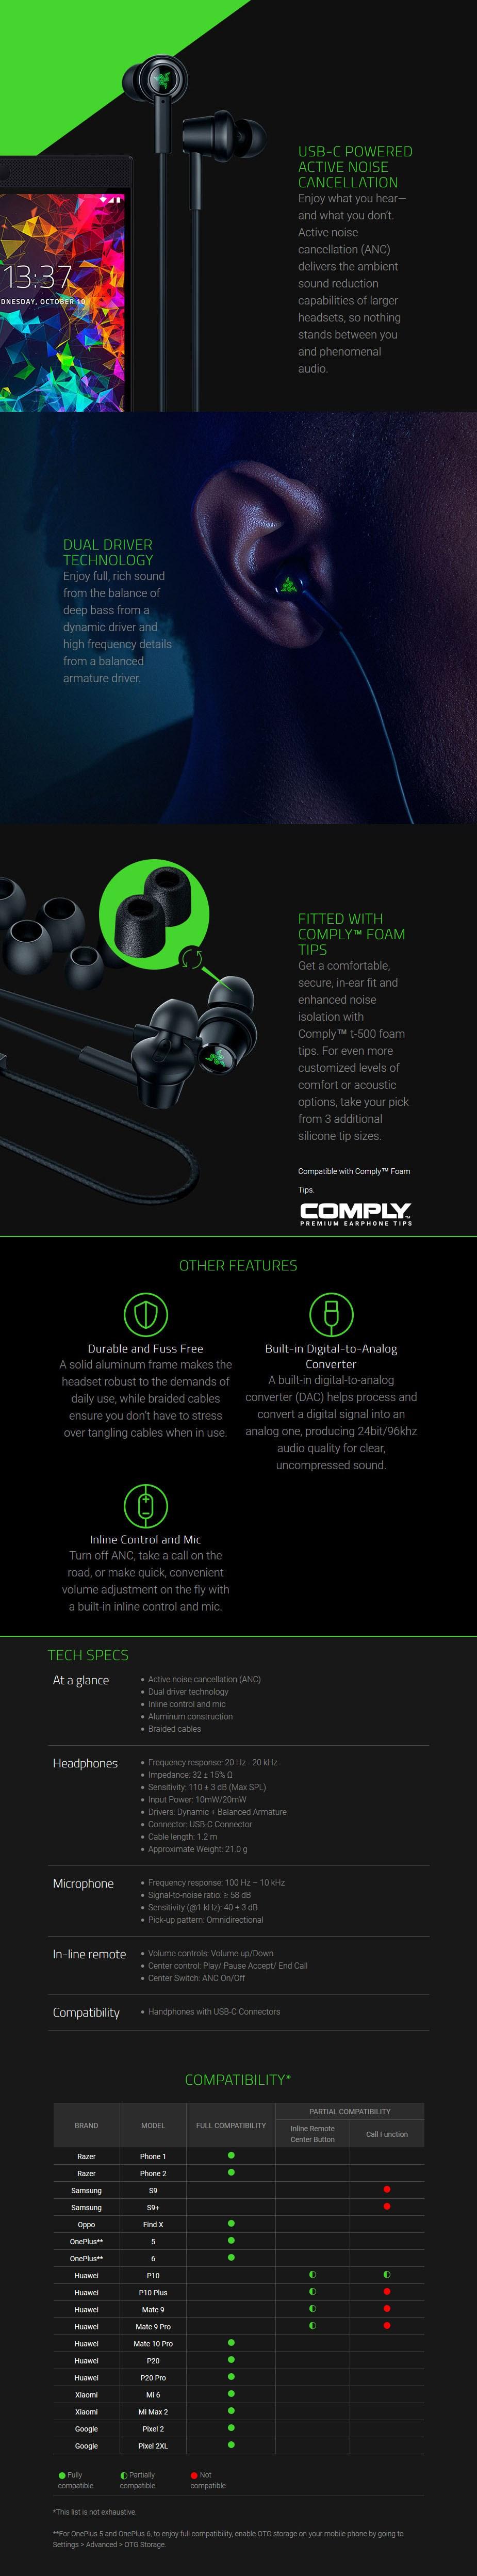 Razer Hammerhead USB-C ANC In-Ear Headphones - Desktop Overview 1